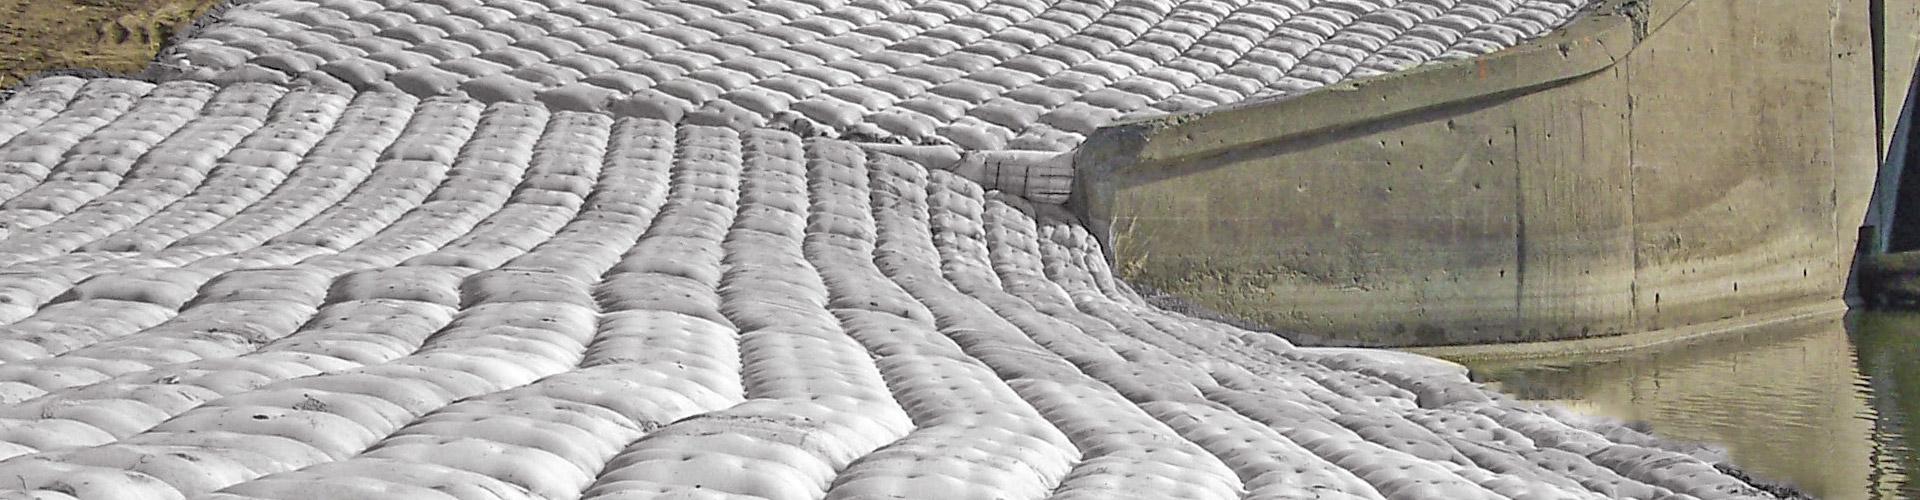 bridge scour, scour remediation, articulating block mat, fabric formed articulating block mat, cast in place mat, unimat